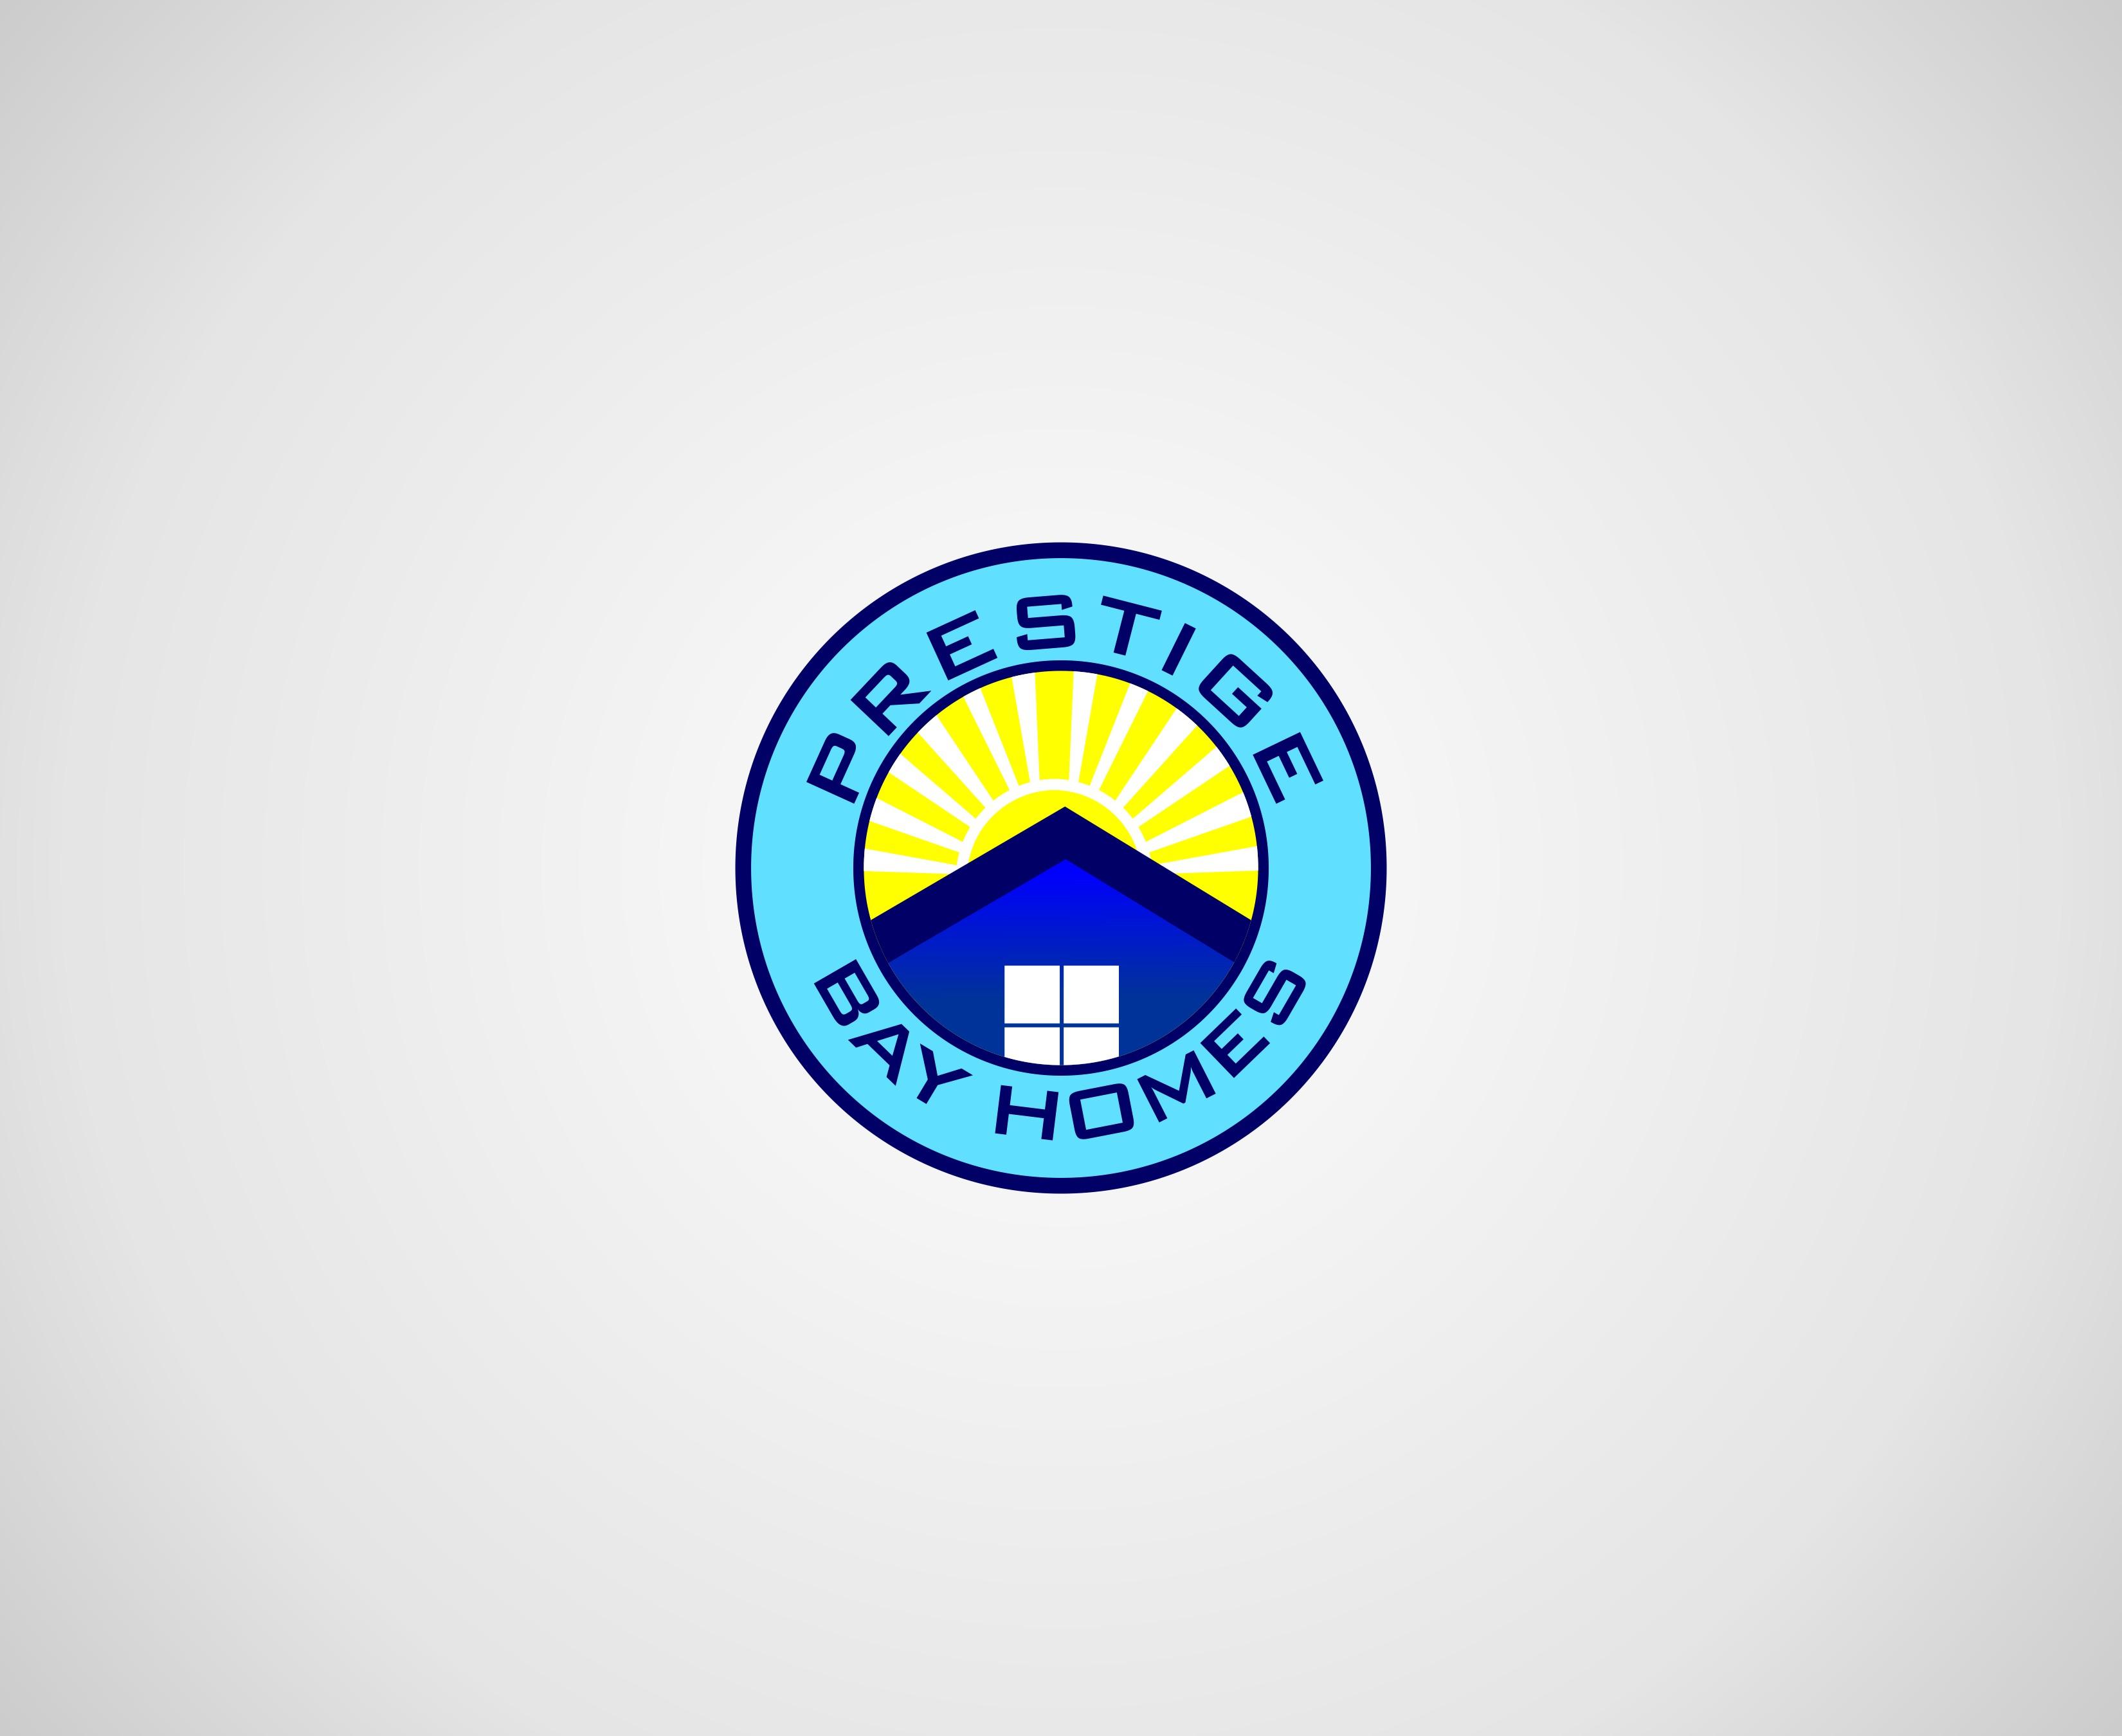 Logo Design by Mhon_Rose - Entry No. 176 in the Logo Design Contest Imaginative Logo Design for Prestige Bay Homes.